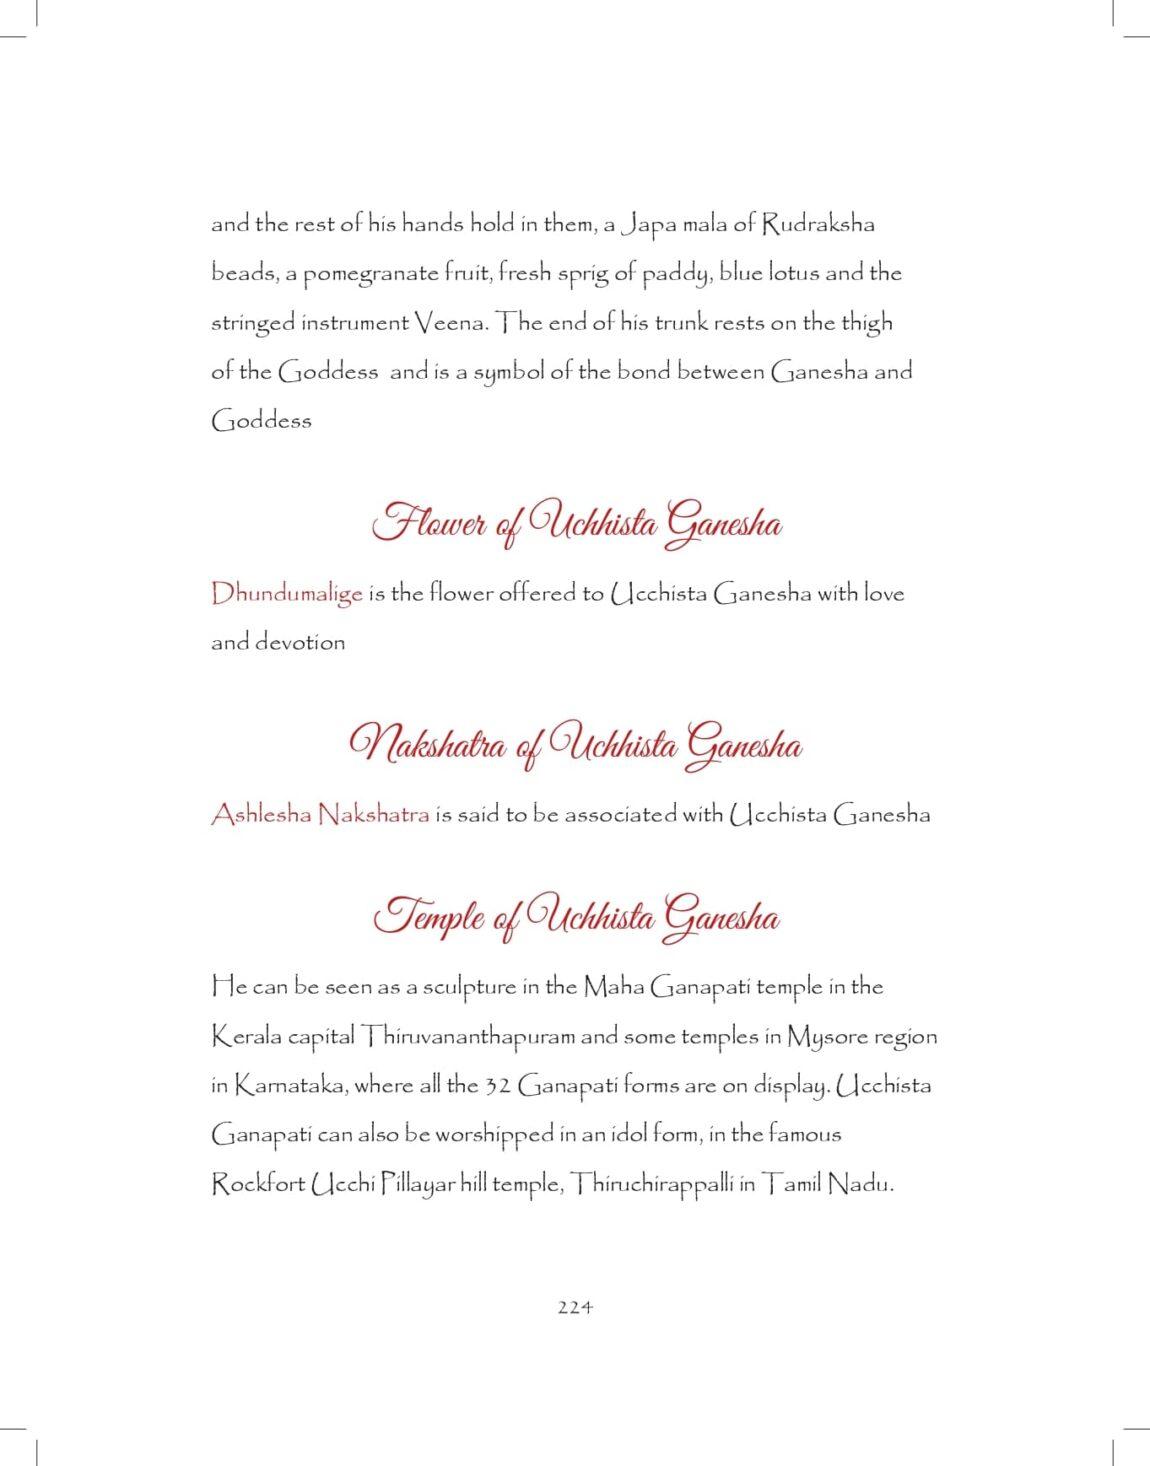 Ganesh-print_pages-to-jpg-0224.jpg